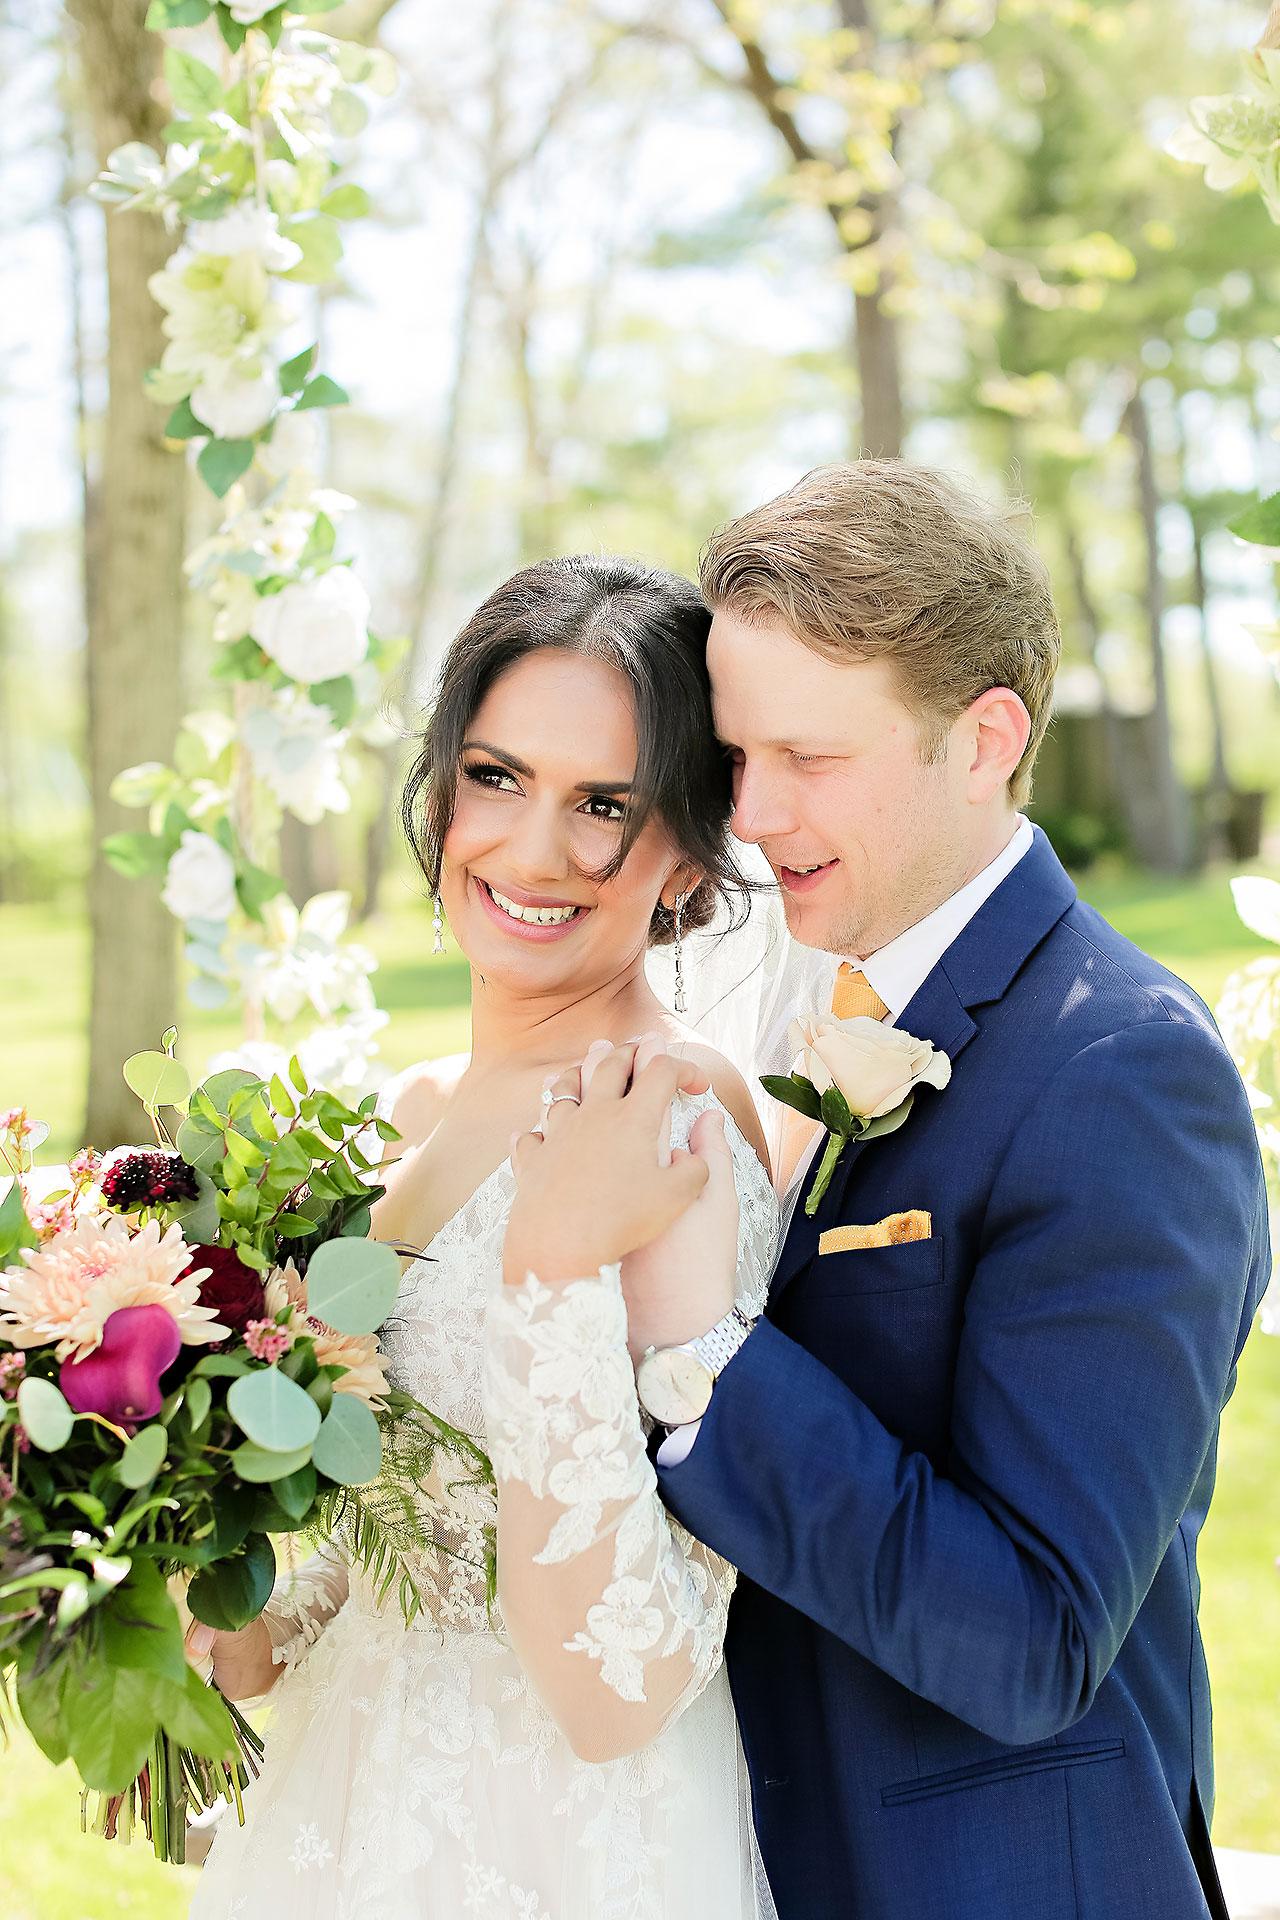 Nadia Parker Black Iris Estate Carmel Indiana Wedding May 2021 063